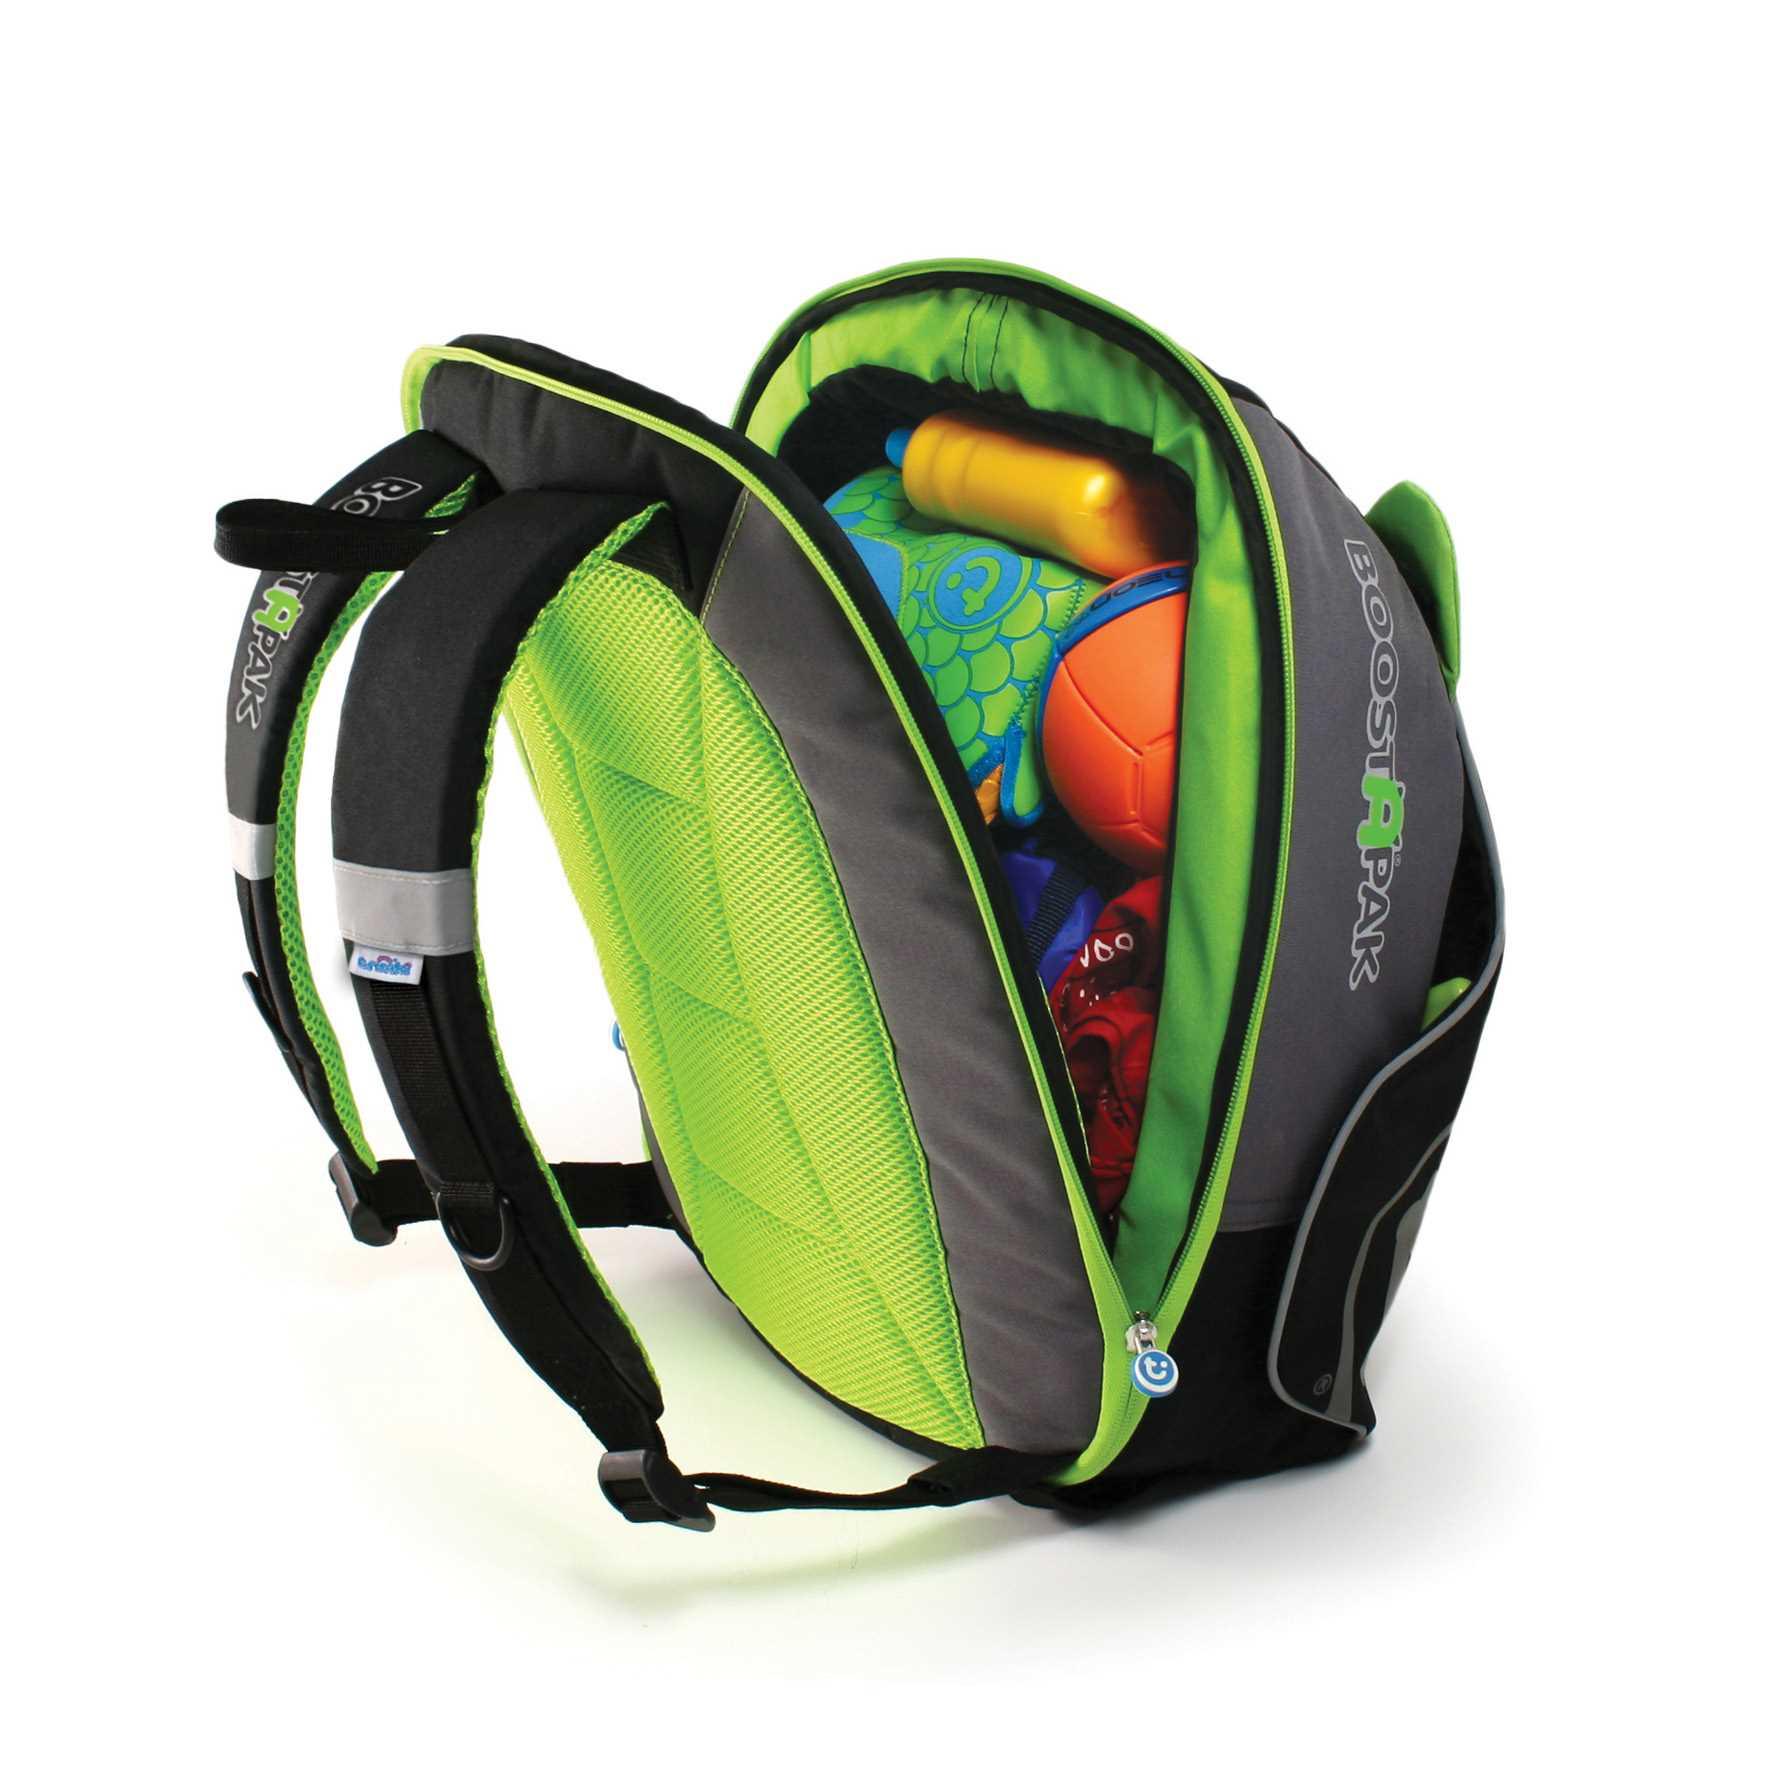 trunki boostapak rucksack und kindersitz 2 in 1 15 36 kg. Black Bedroom Furniture Sets. Home Design Ideas